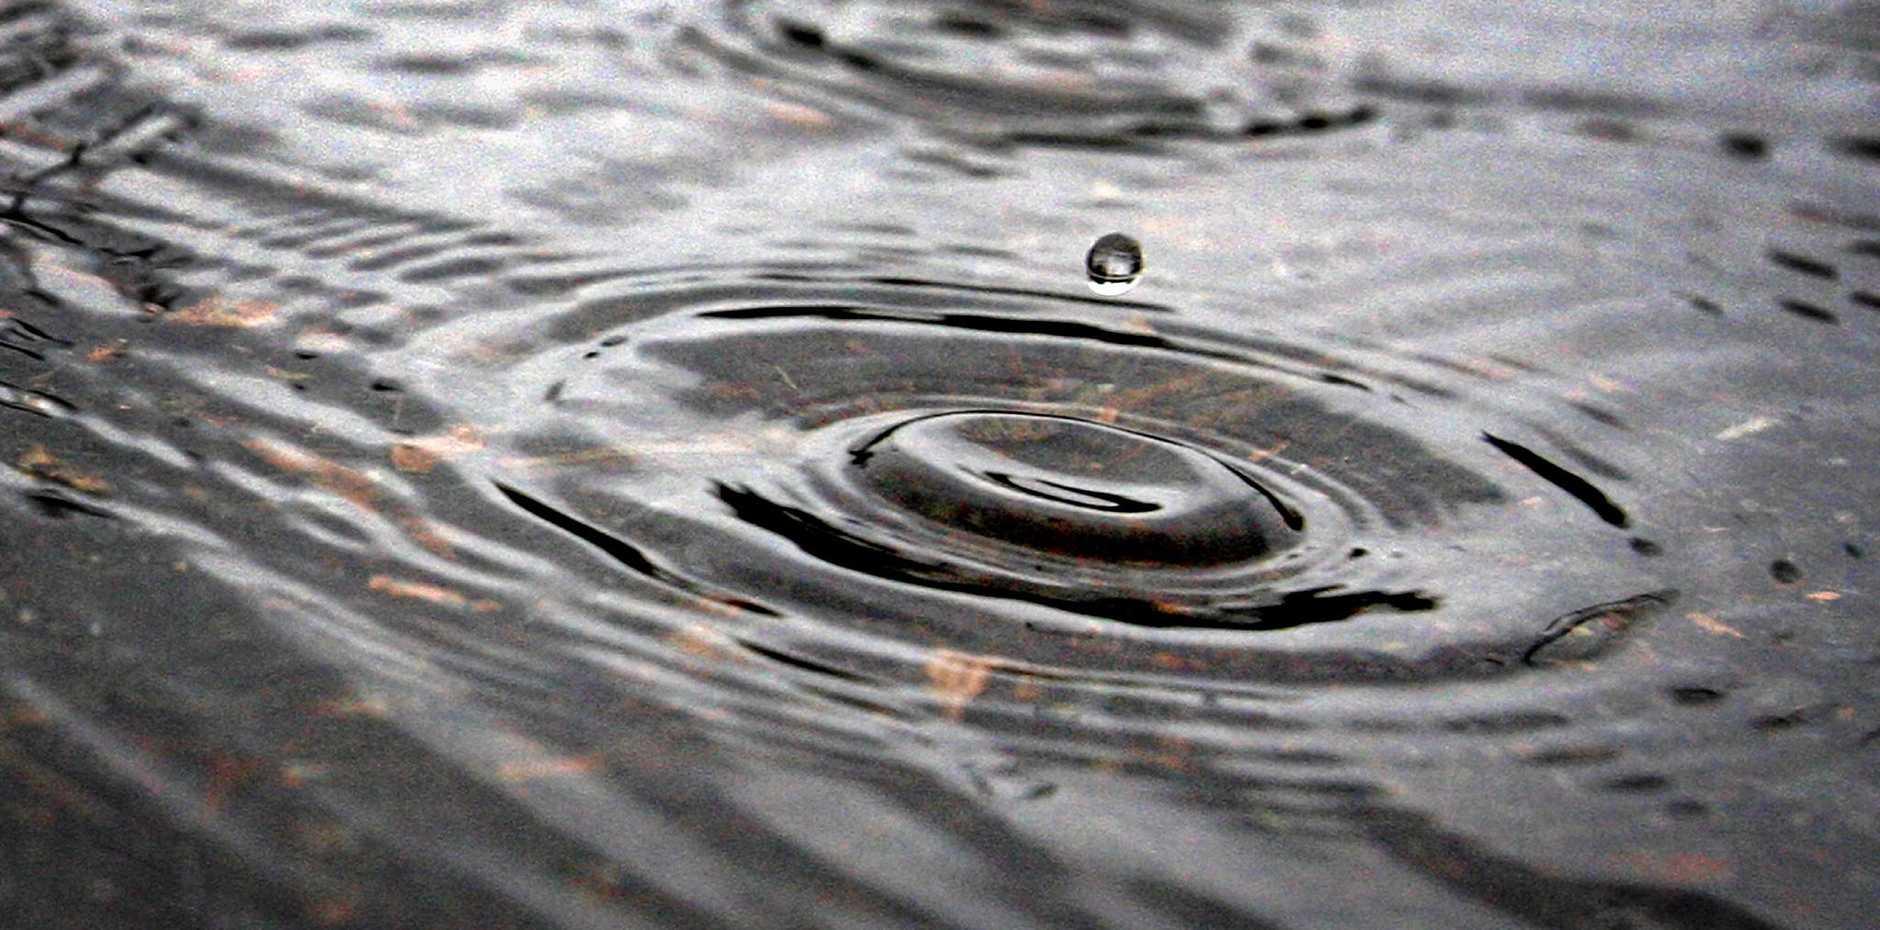 One of billions of Rain Drops falls on the tweed Photo Blainey Woodham / Daily News